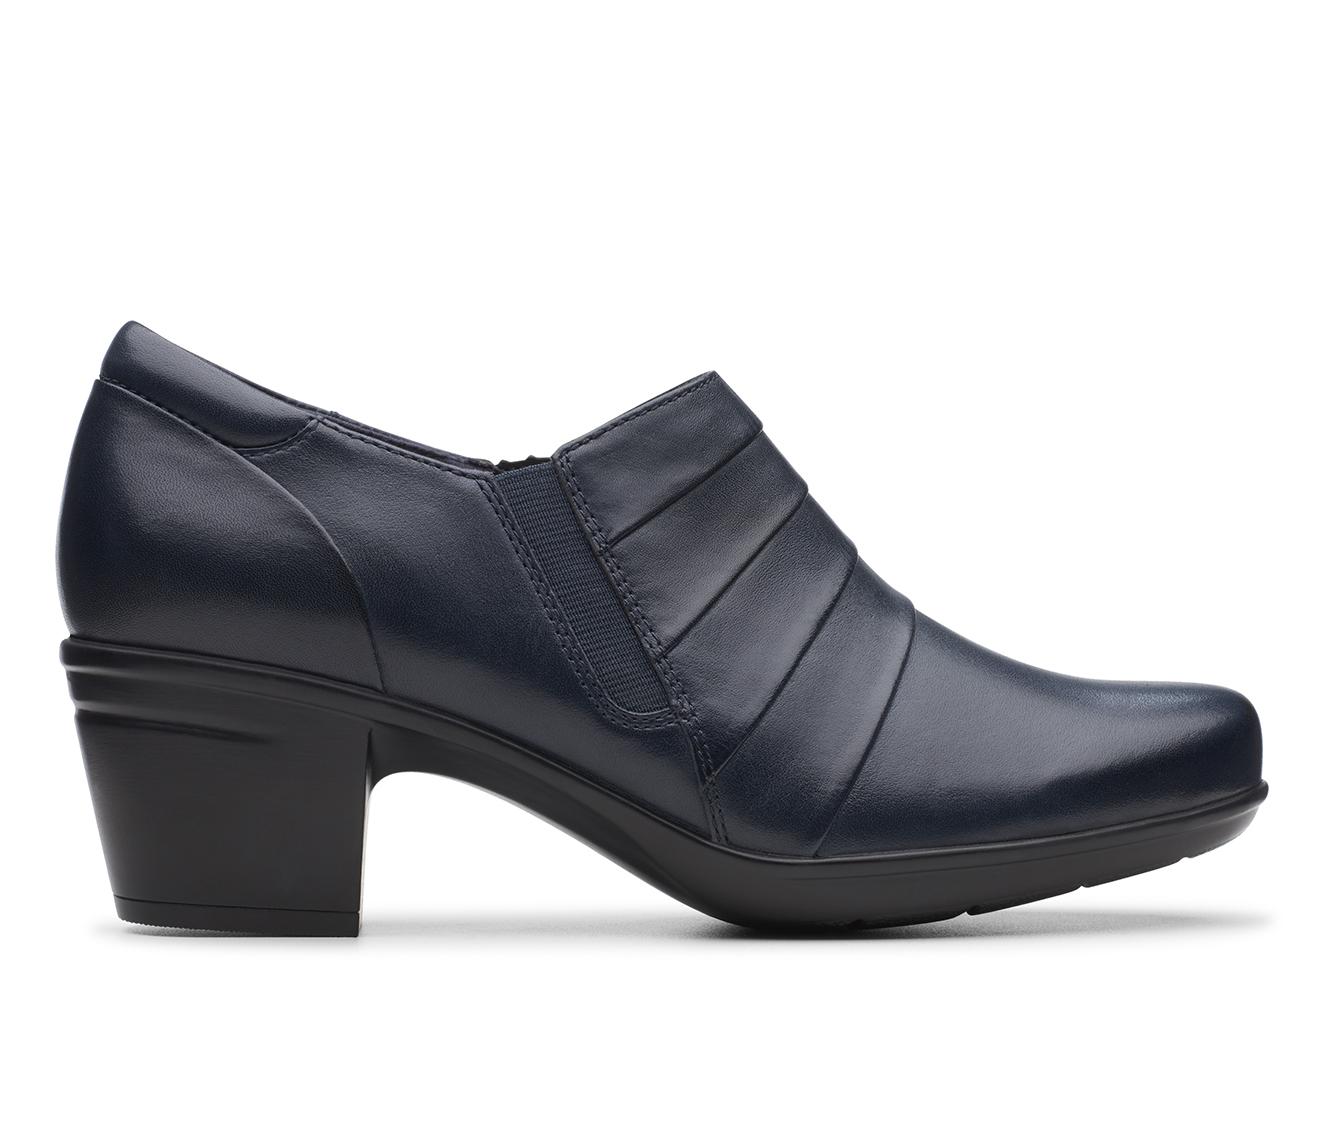 Clarks Emslie Guide Women's Shoe (Blue Leather)